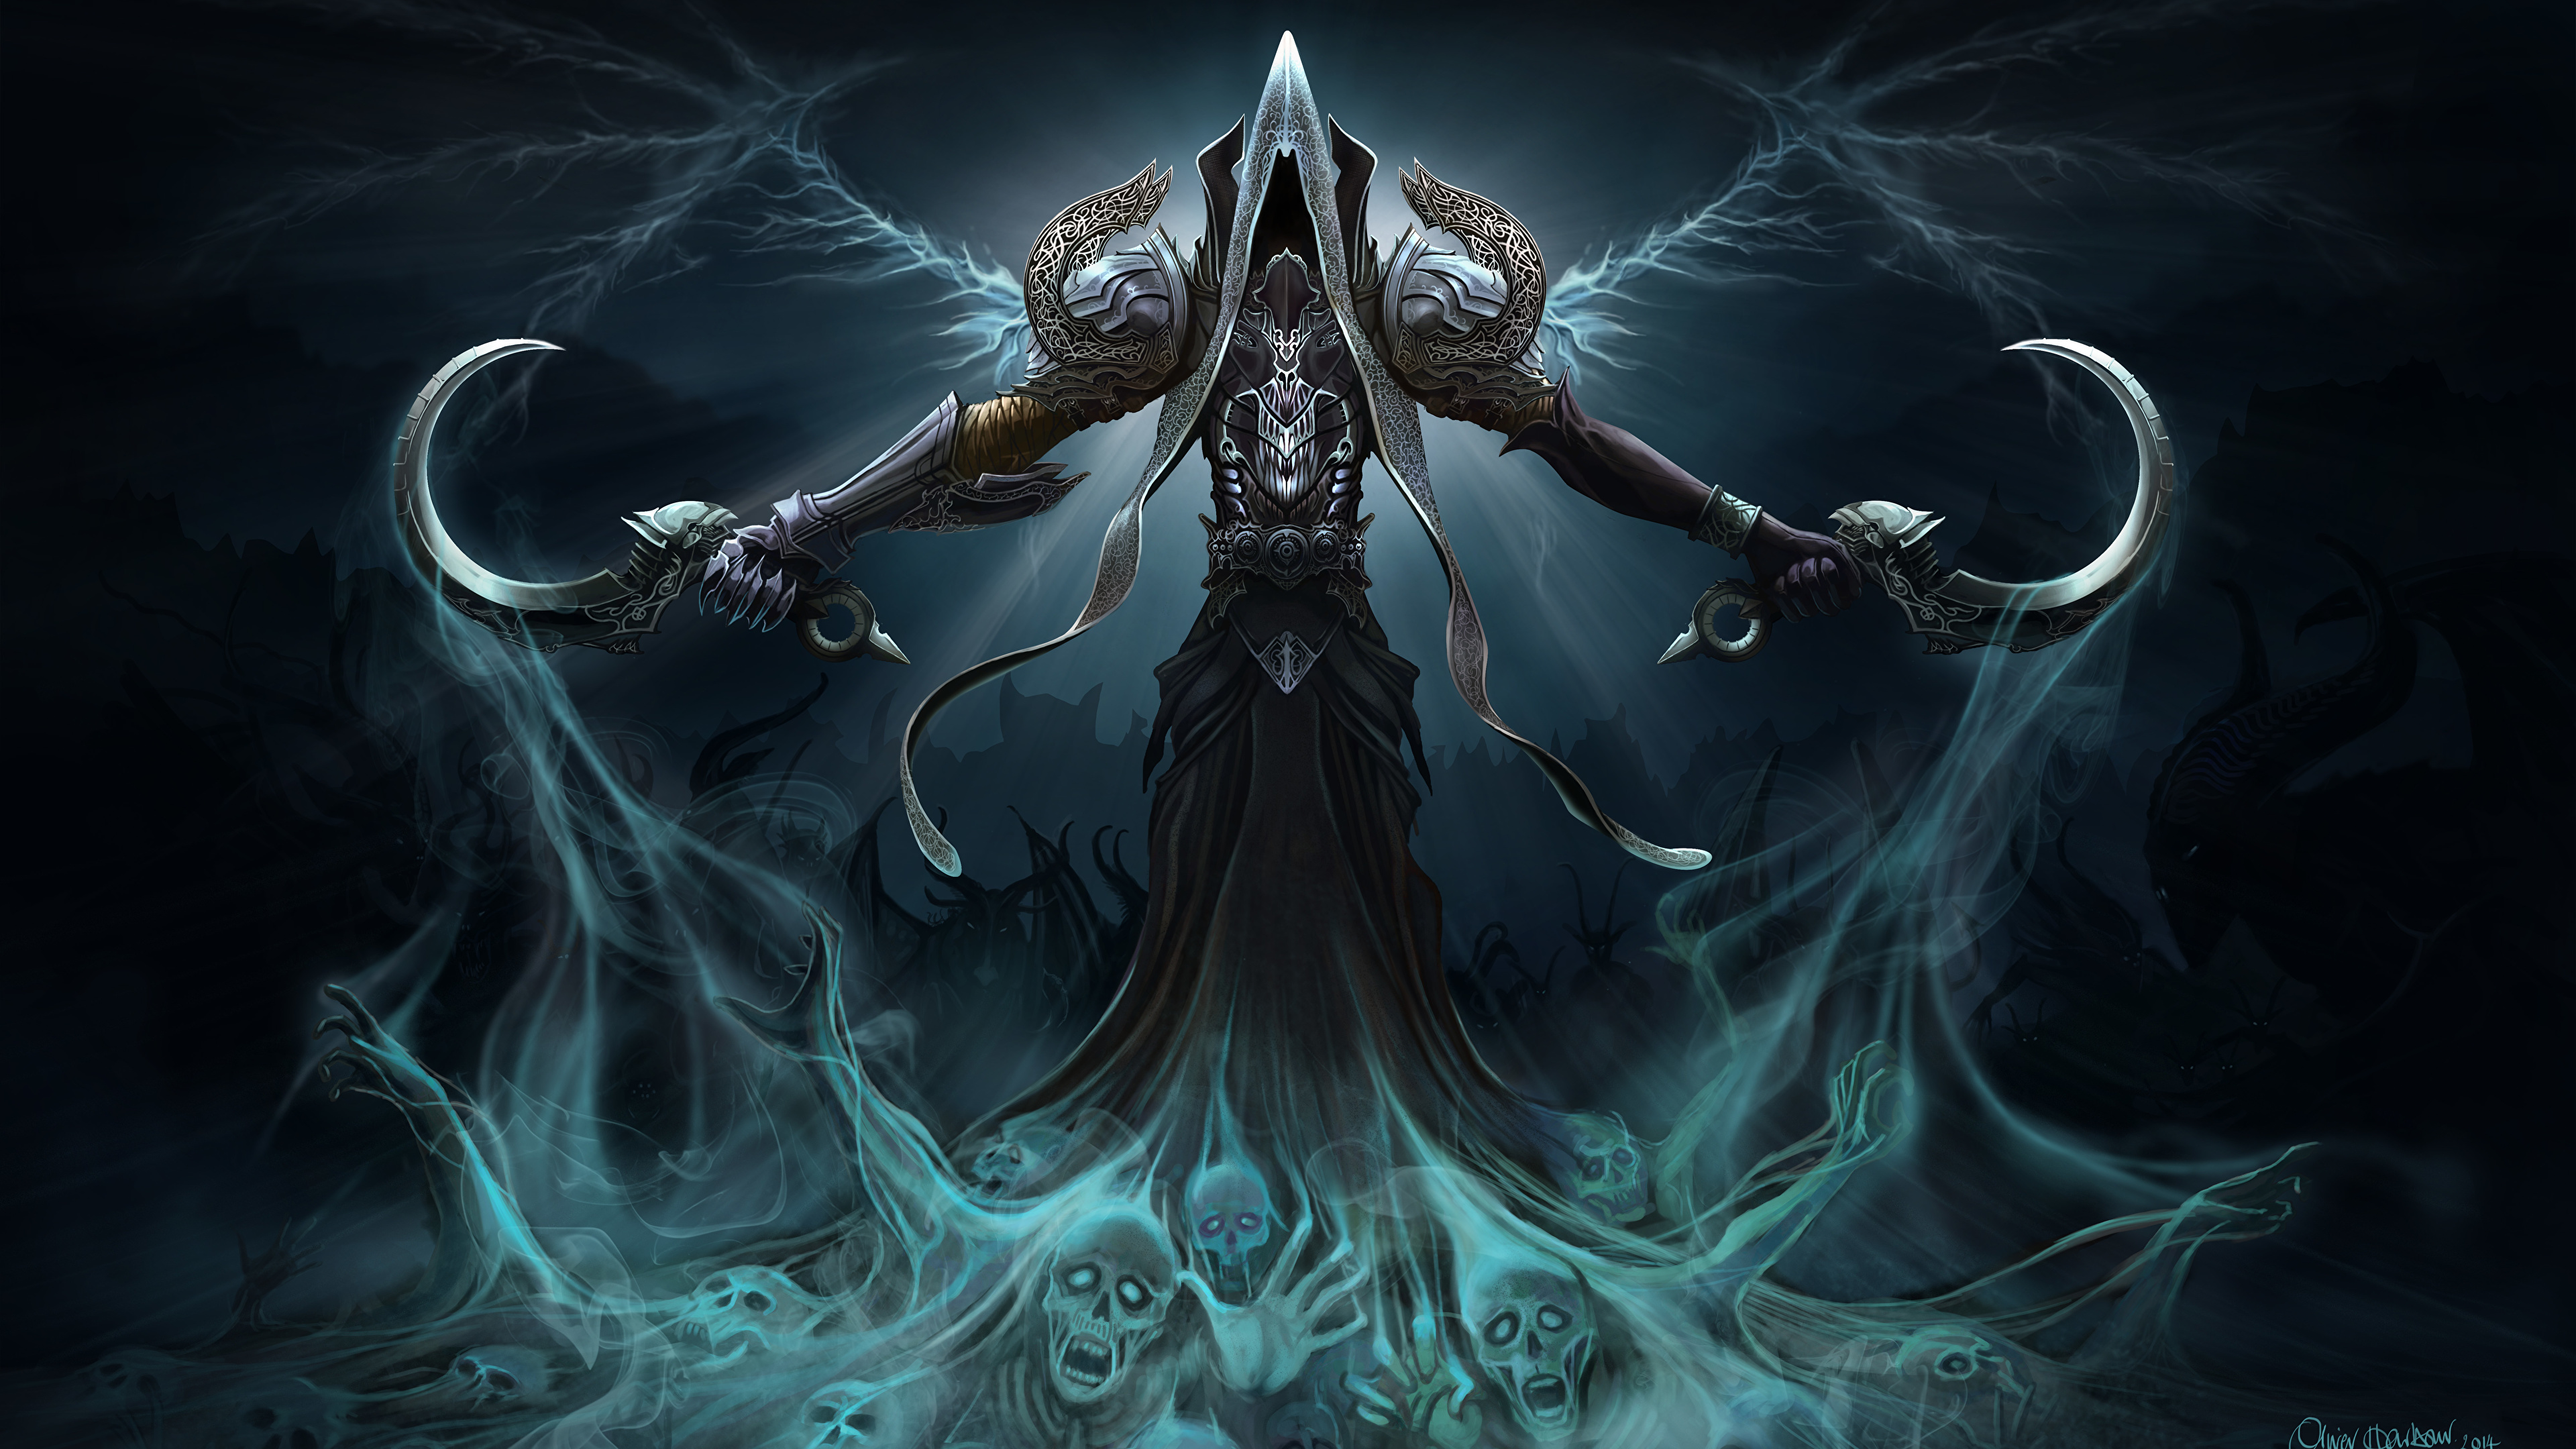 Papeis de parede Magia Demônios Batalha Heroes of the